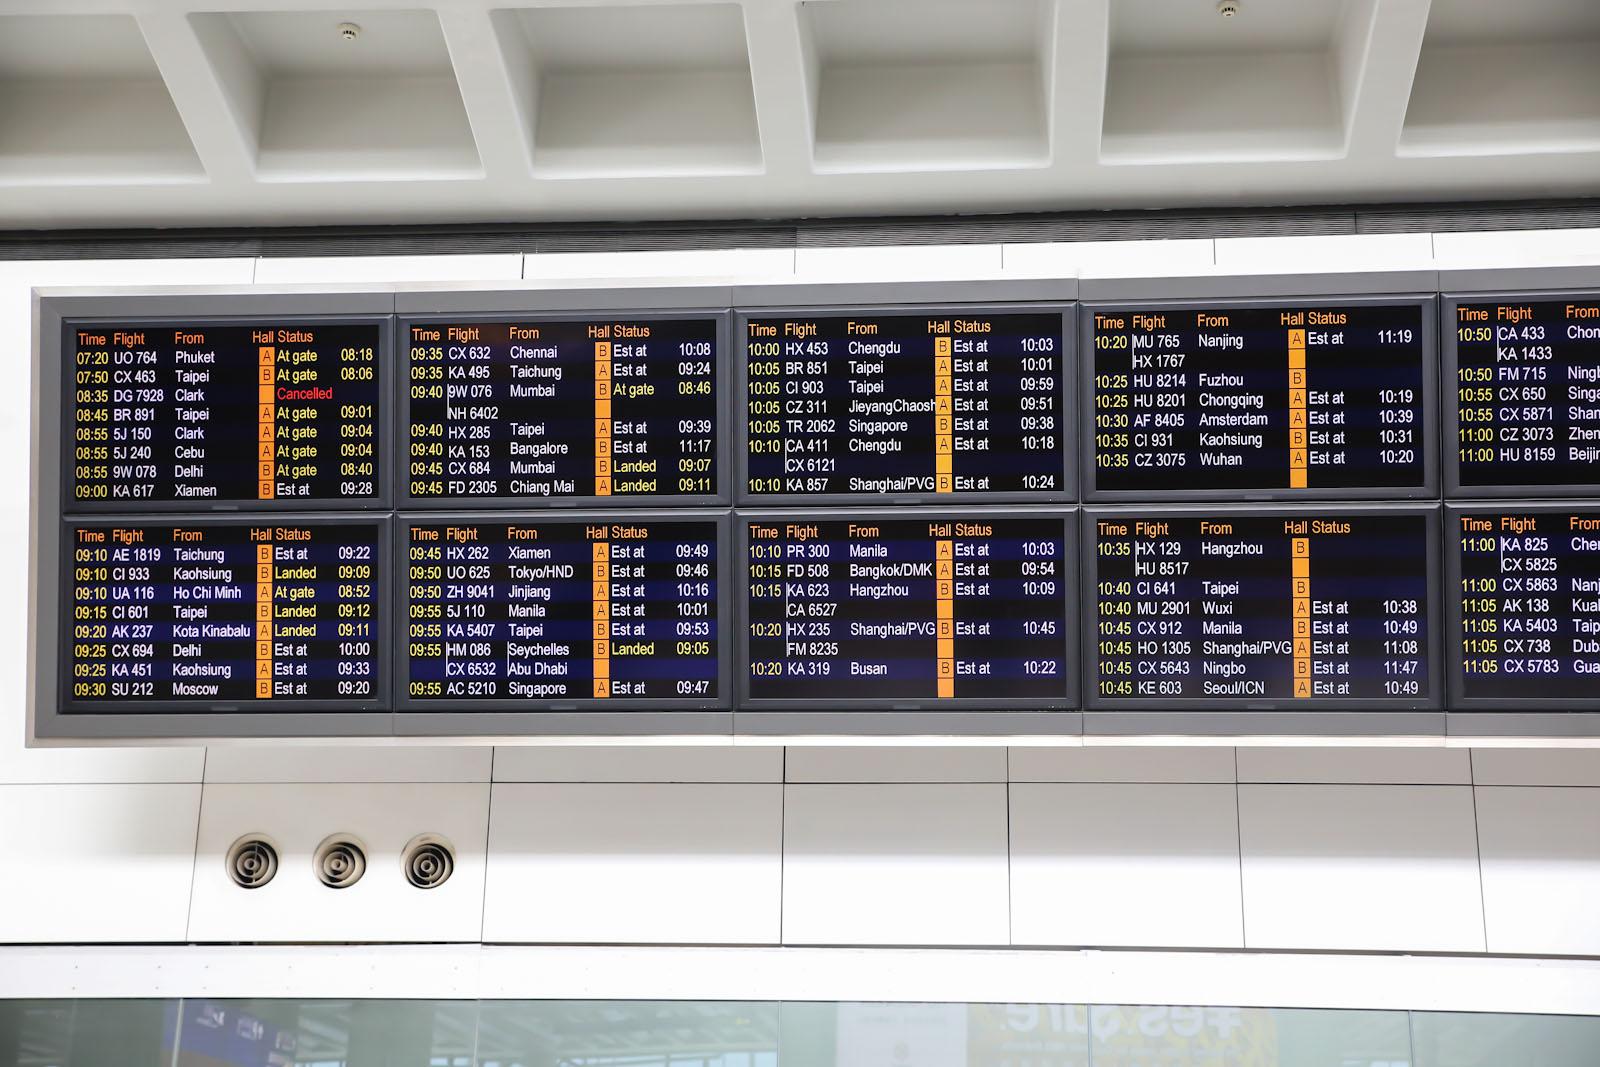 Онлайн-табло прилетов в аэропорту Гонконга